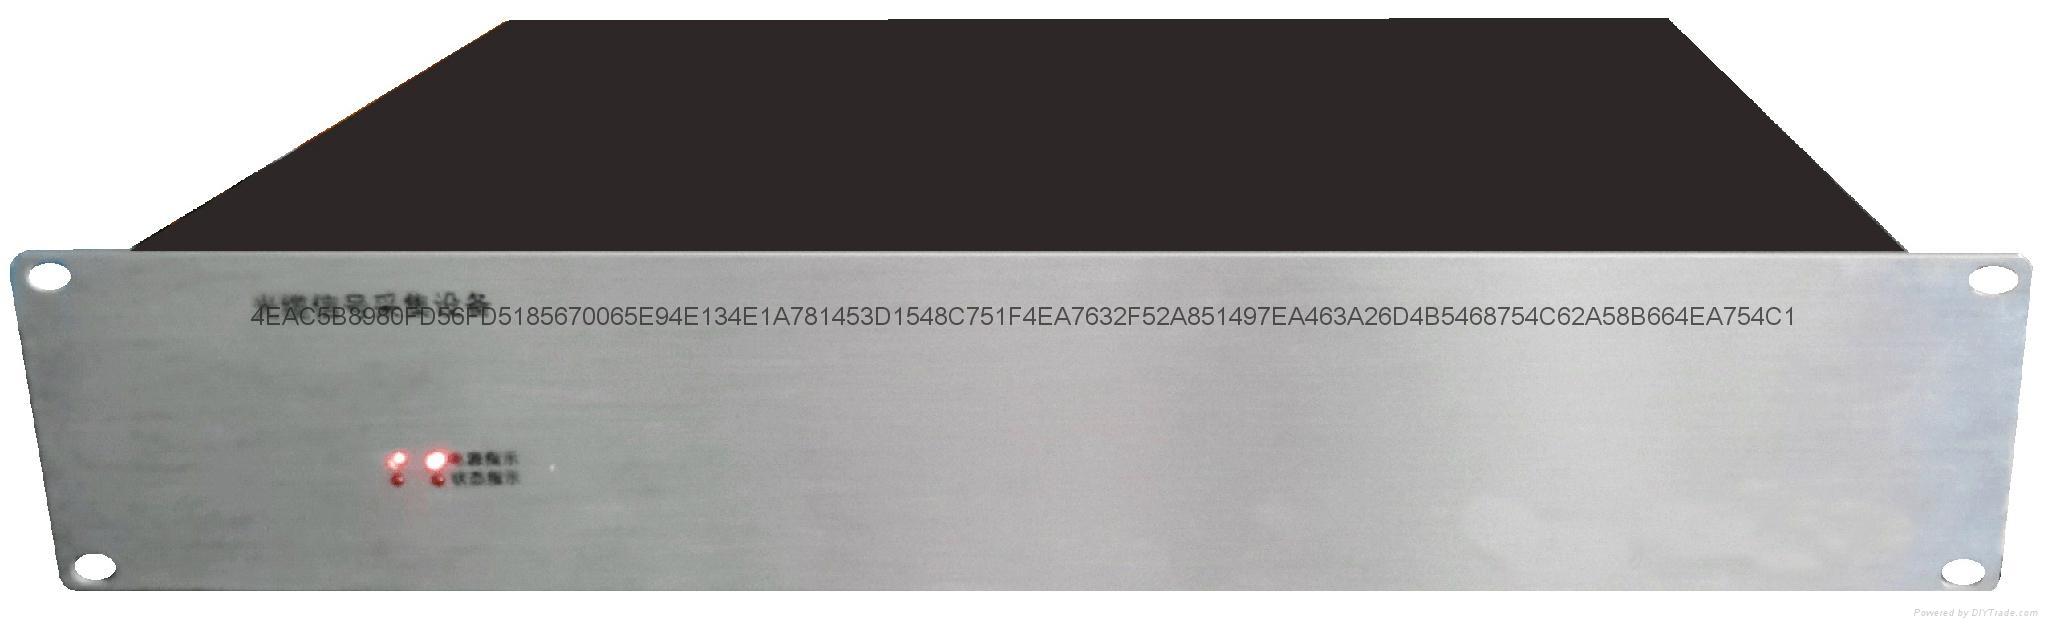 One Optical Cable Fiber Optic Vibration Sensor Perimeter Alarm System 2